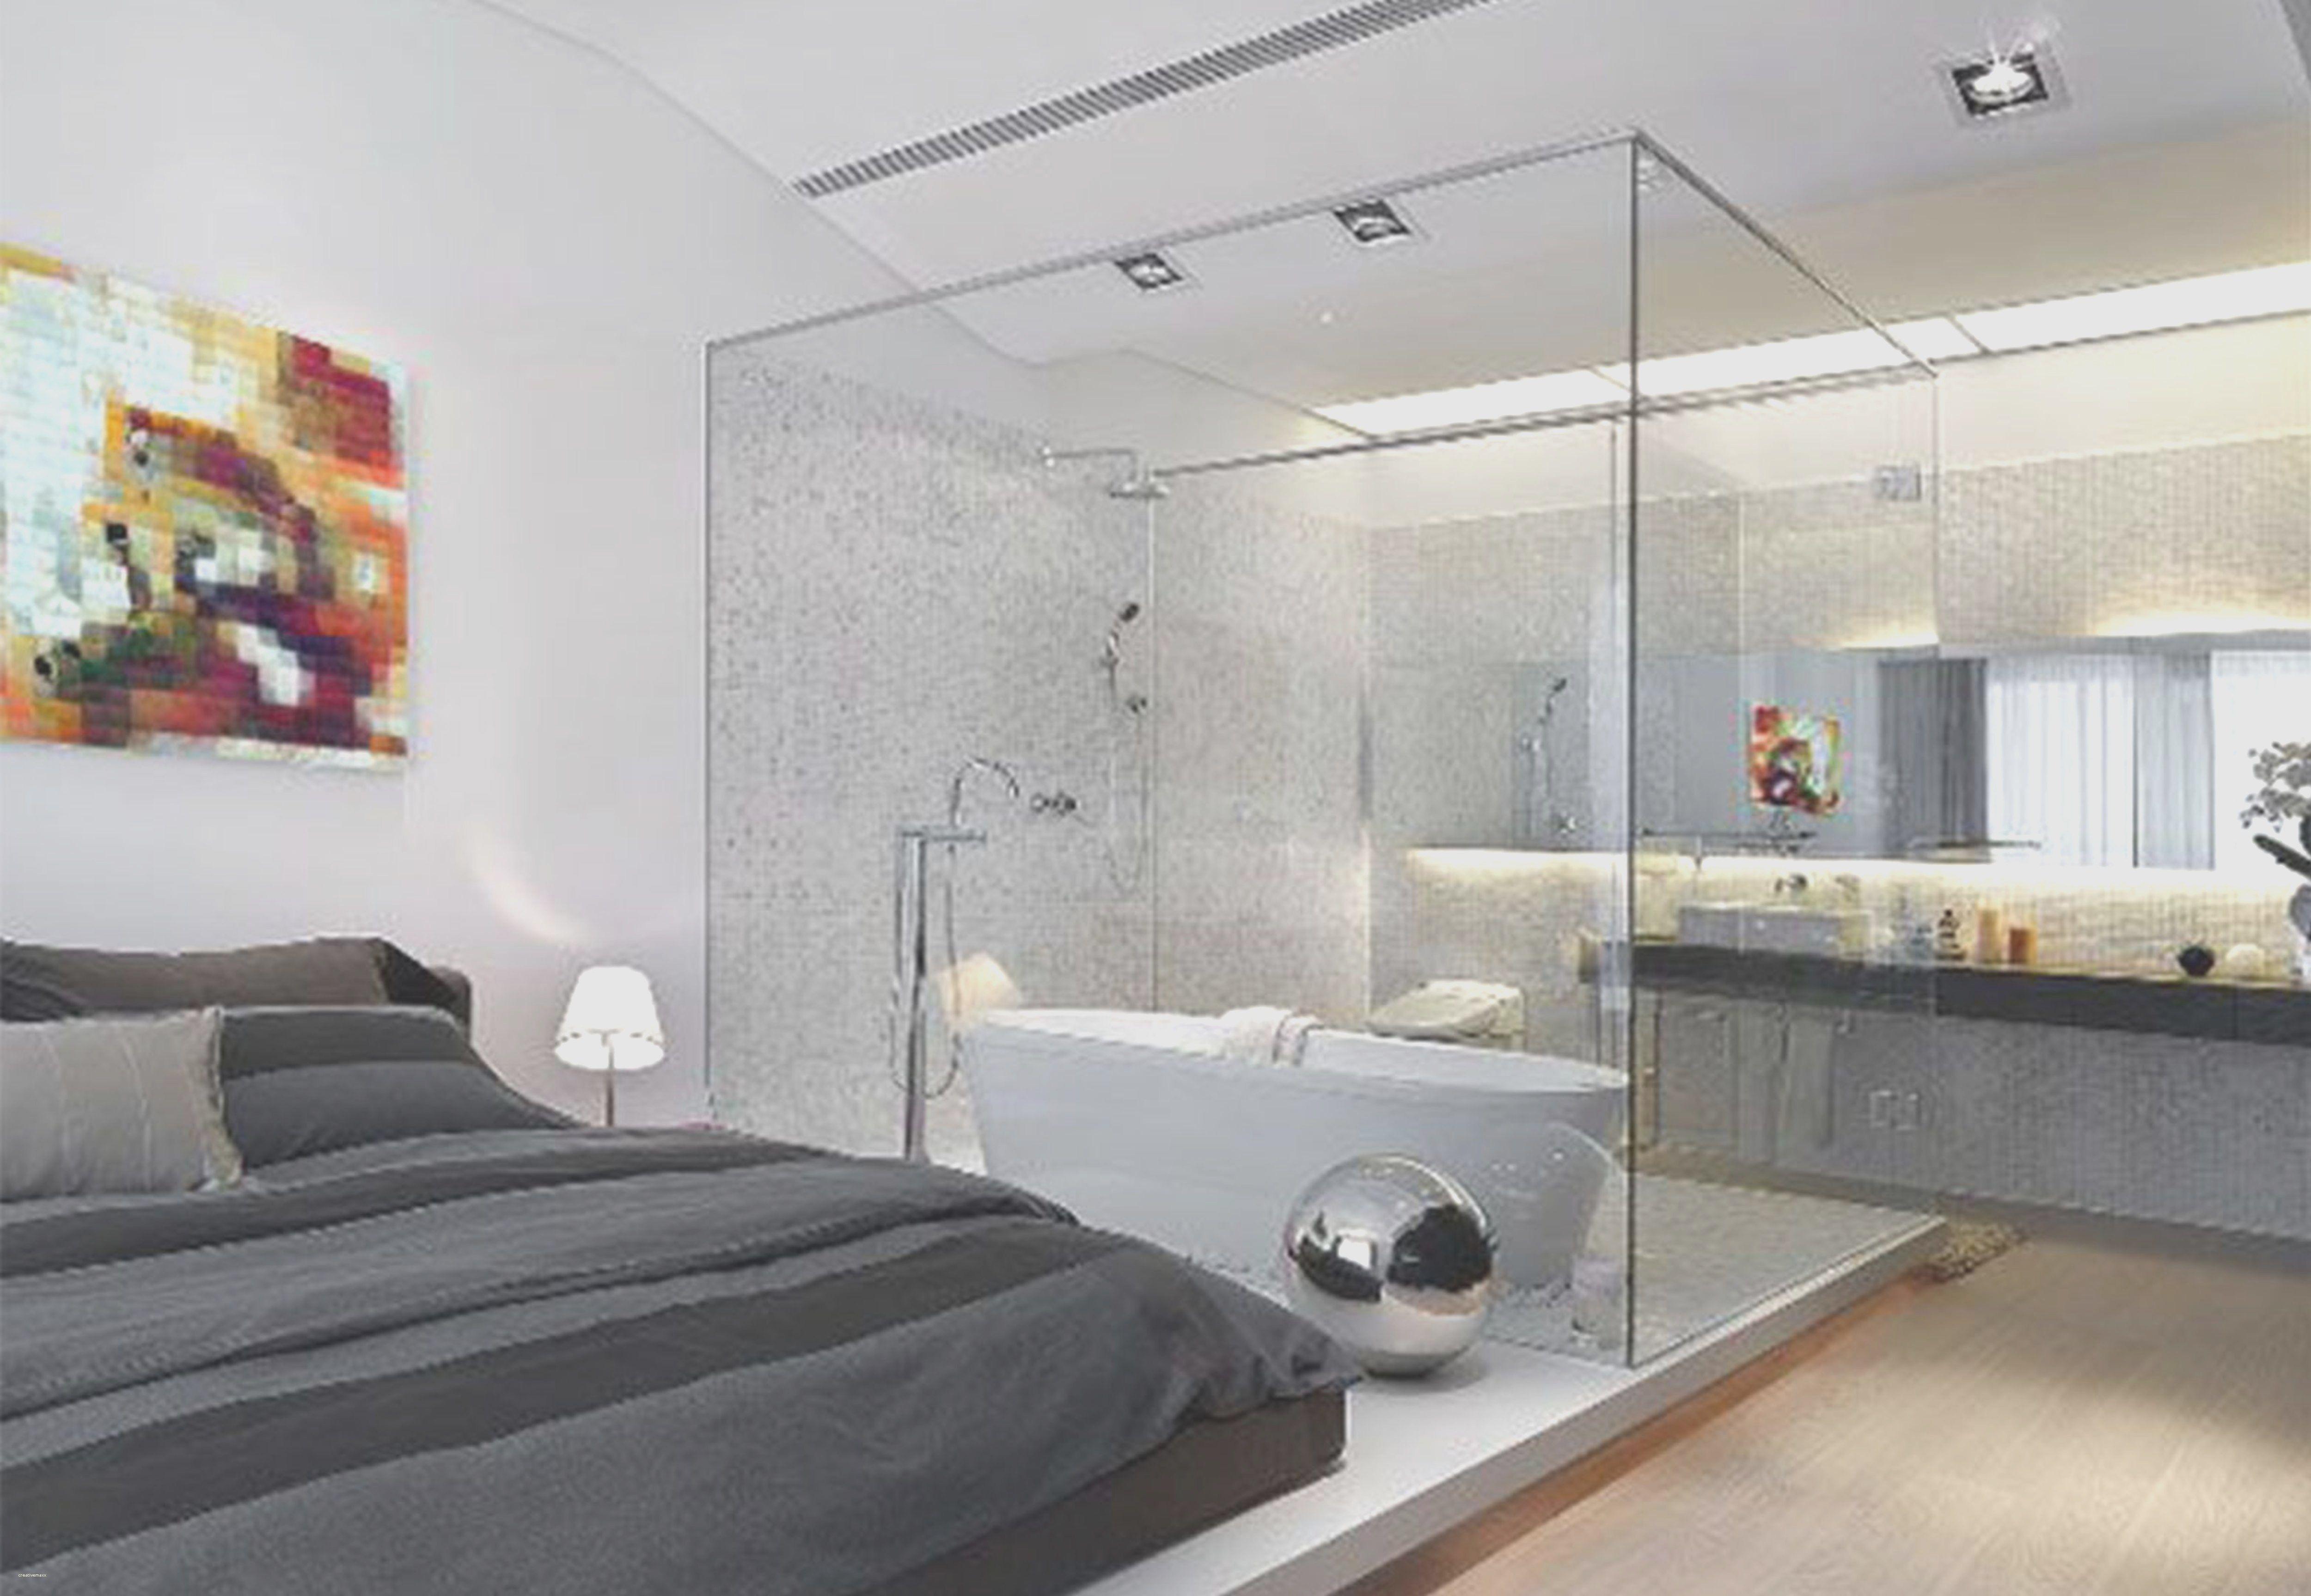 Marble Bedroom Decor Ideas Awesome Marble Bedroom Decor Ideas Minimalist Interior Design Bed Modern Bedroom Design Interior Design Bedroom Bed Design Modern